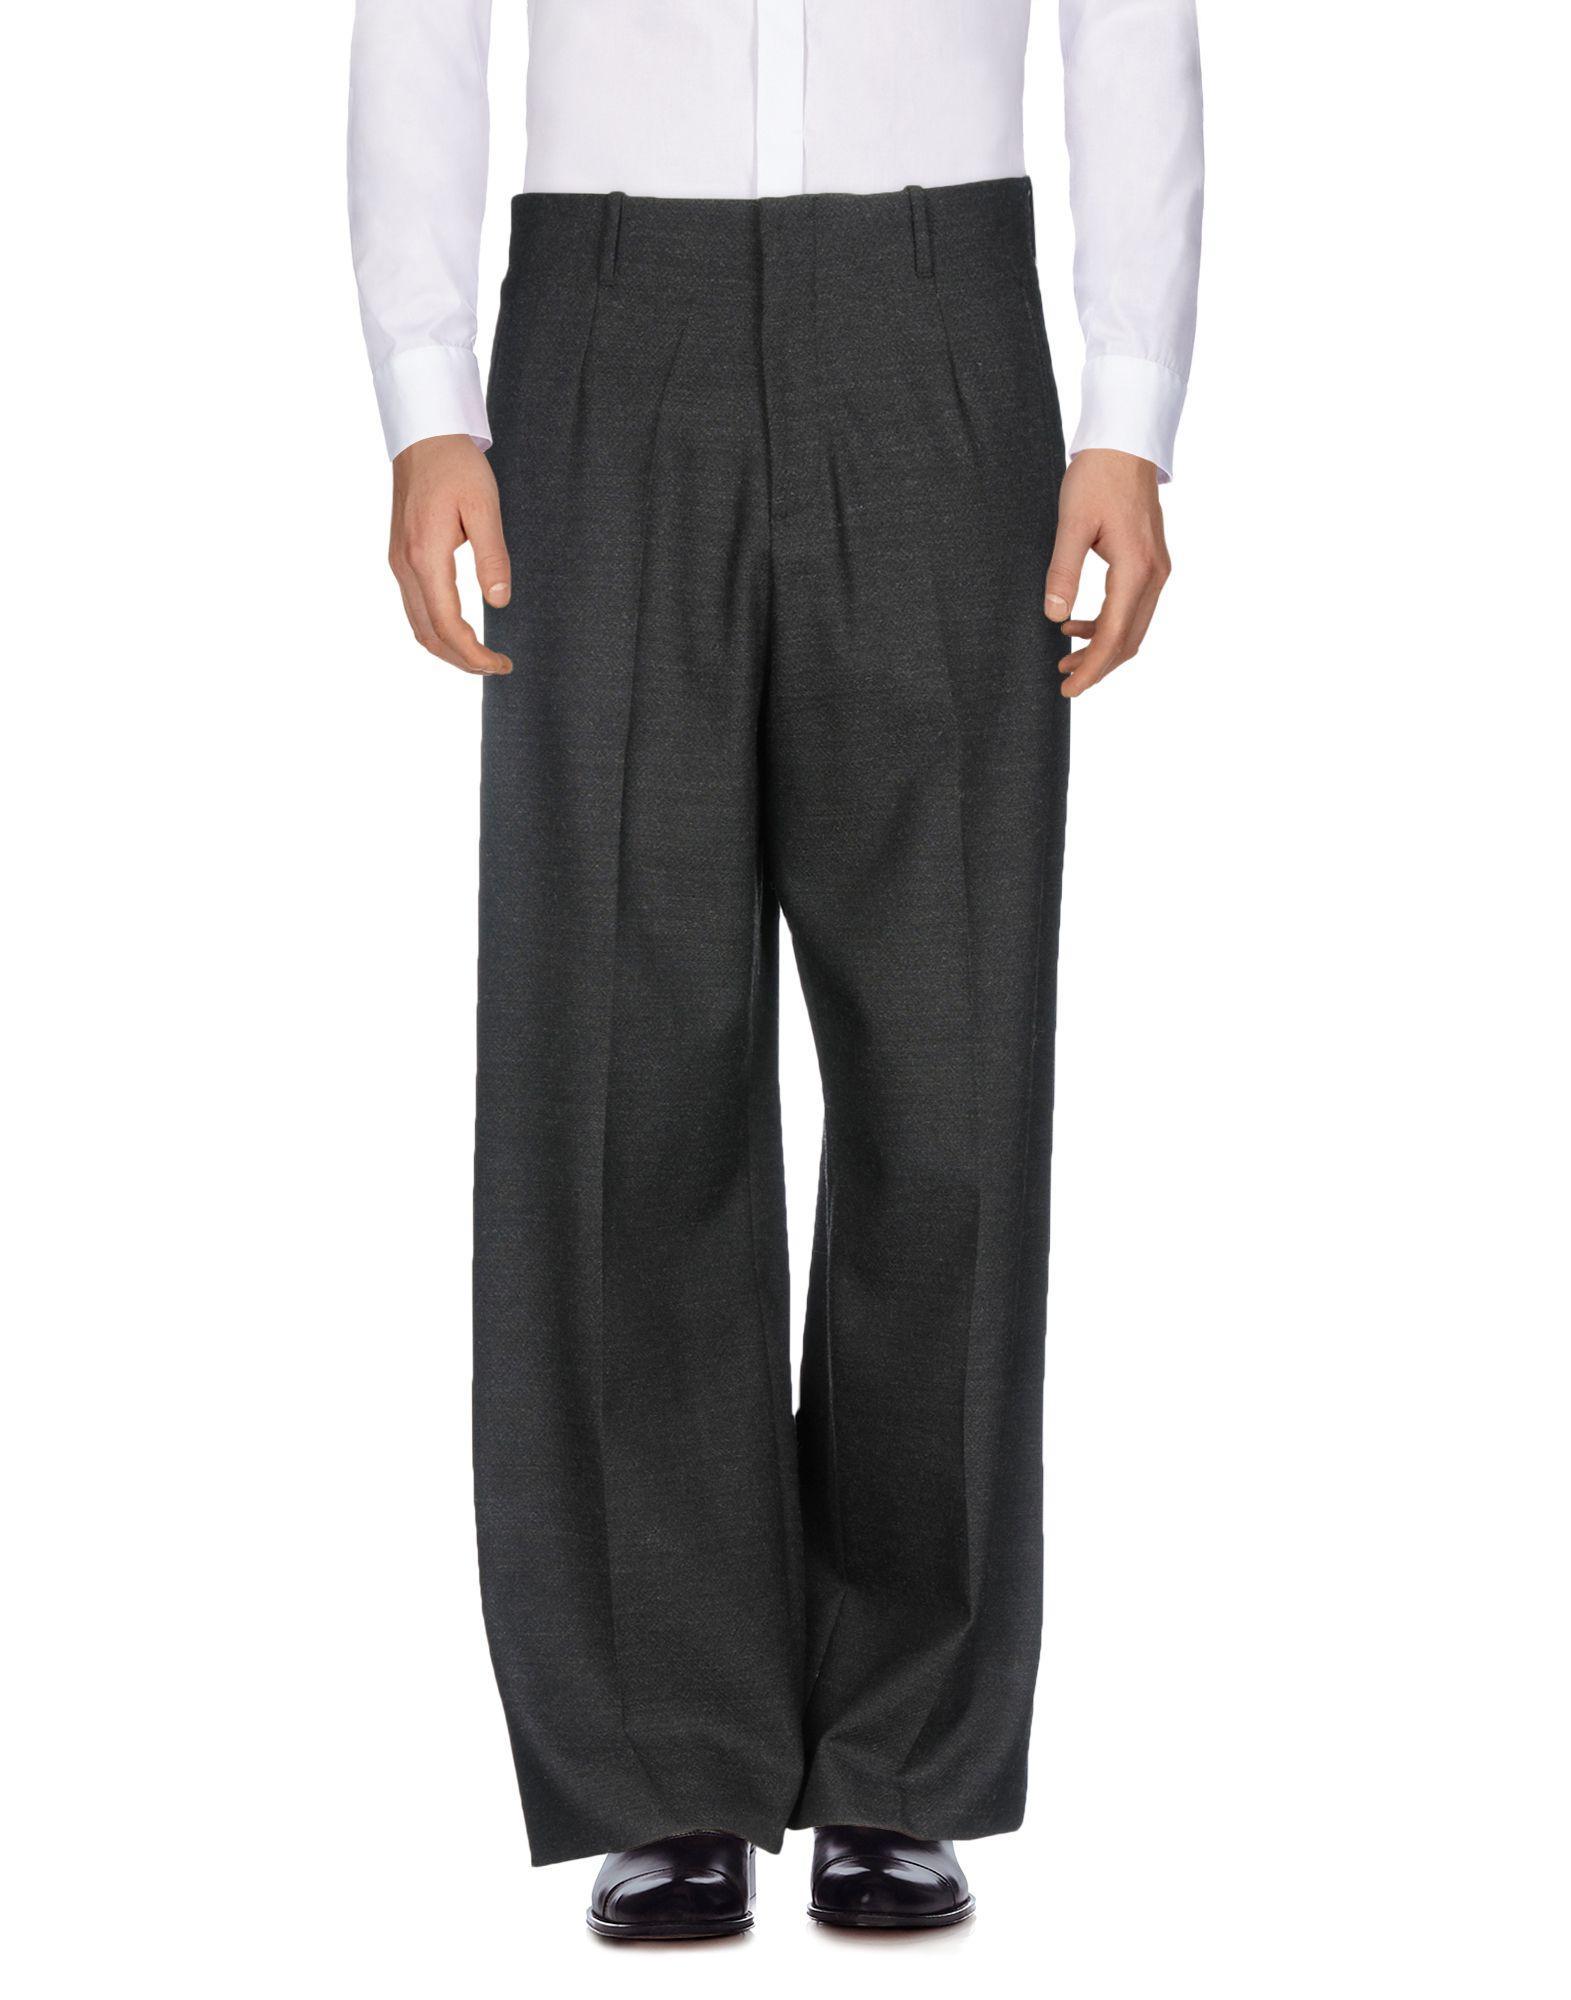 Umit Benan Casual Pants In Steel Grey